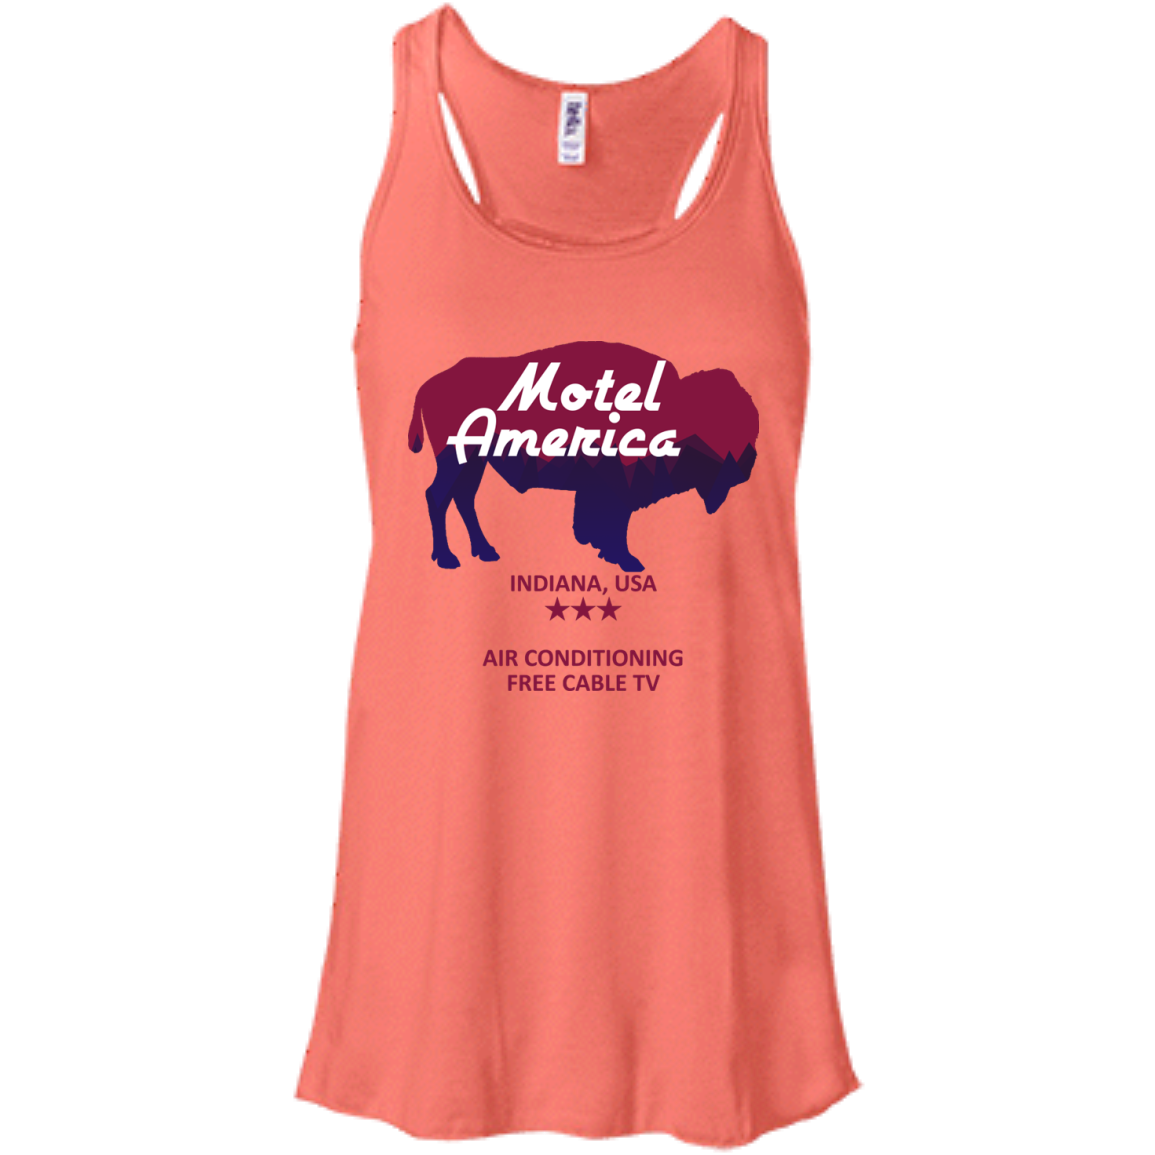 image 382px Motel America, Indiana USA Shirt Home of the Gods T Shirts